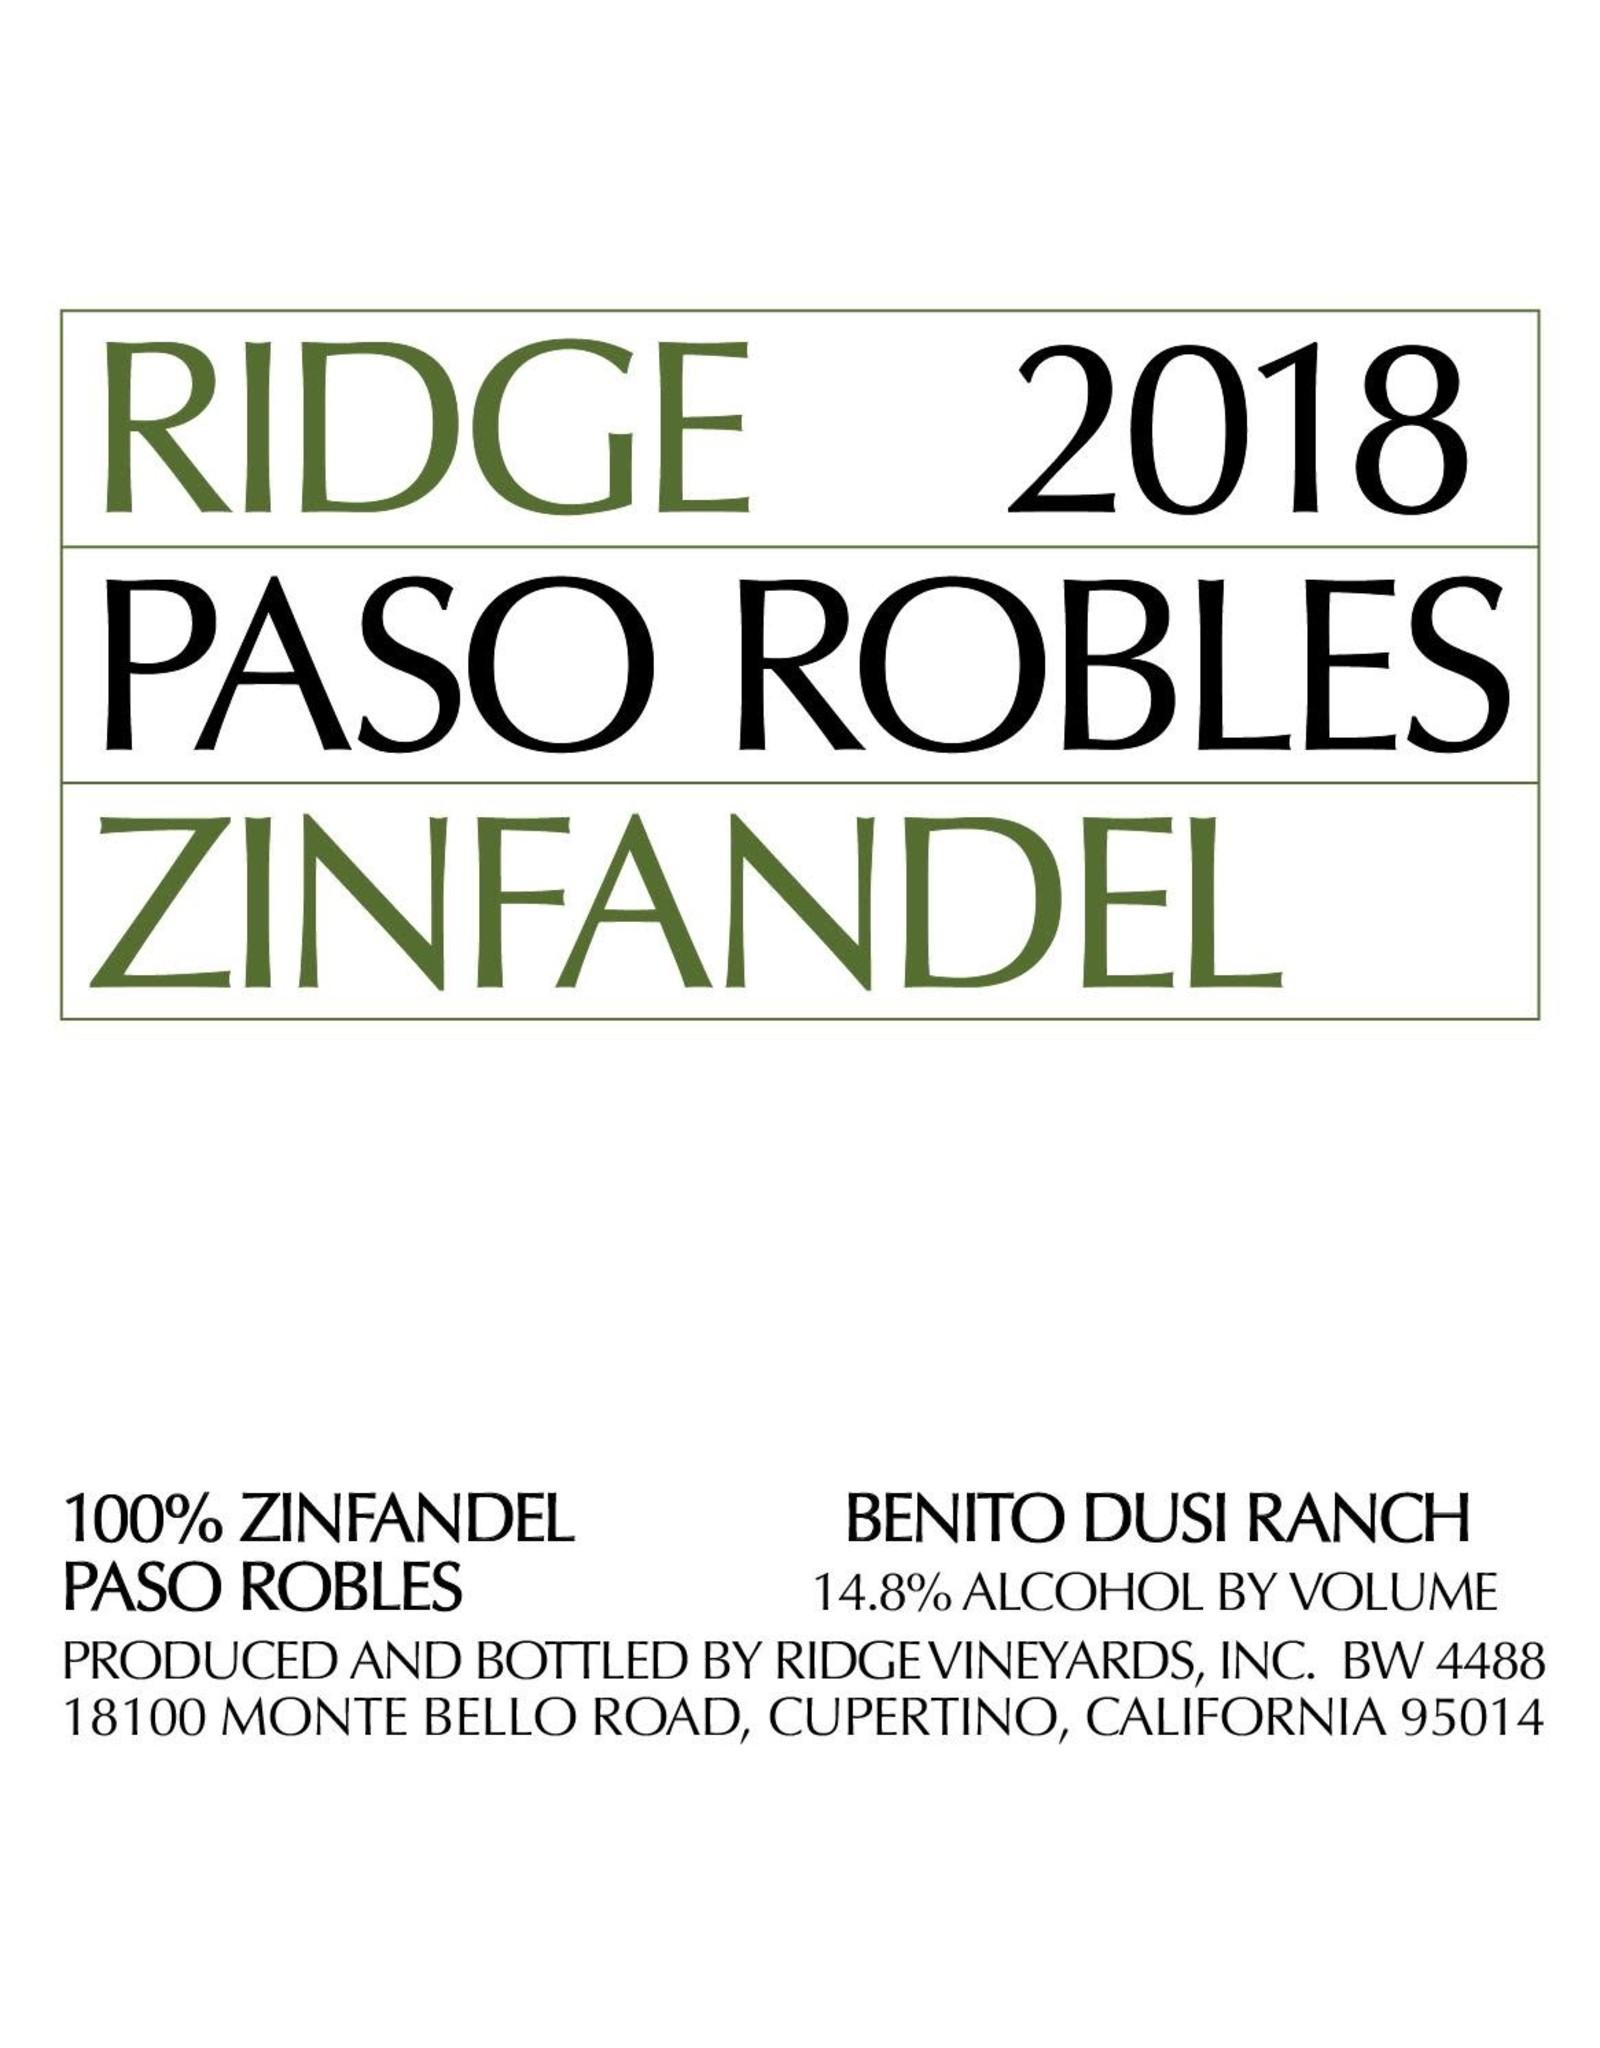 Ridge Vineyards Ridge Zinfandel 'Paso Robles' (2018)